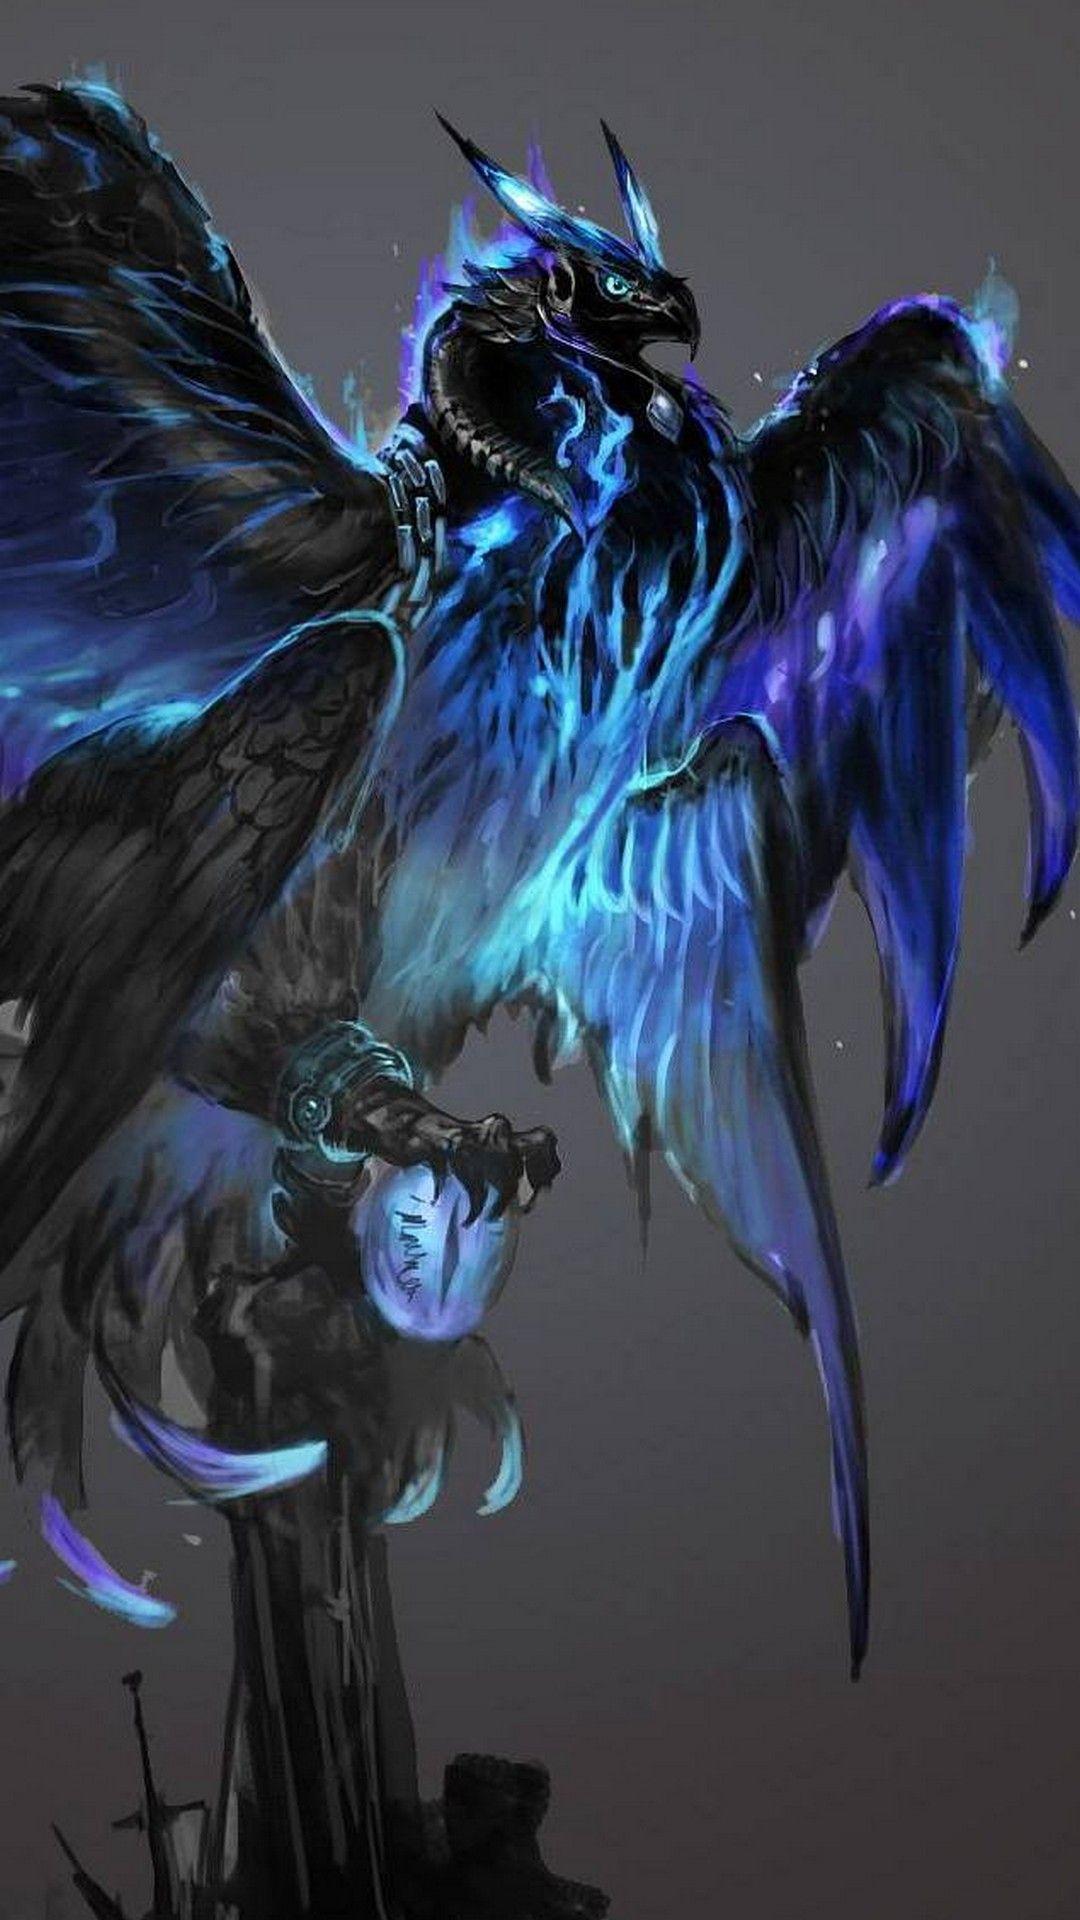 Blue Phoenix Wallpapers Top Free Blue Phoenix Backgrounds